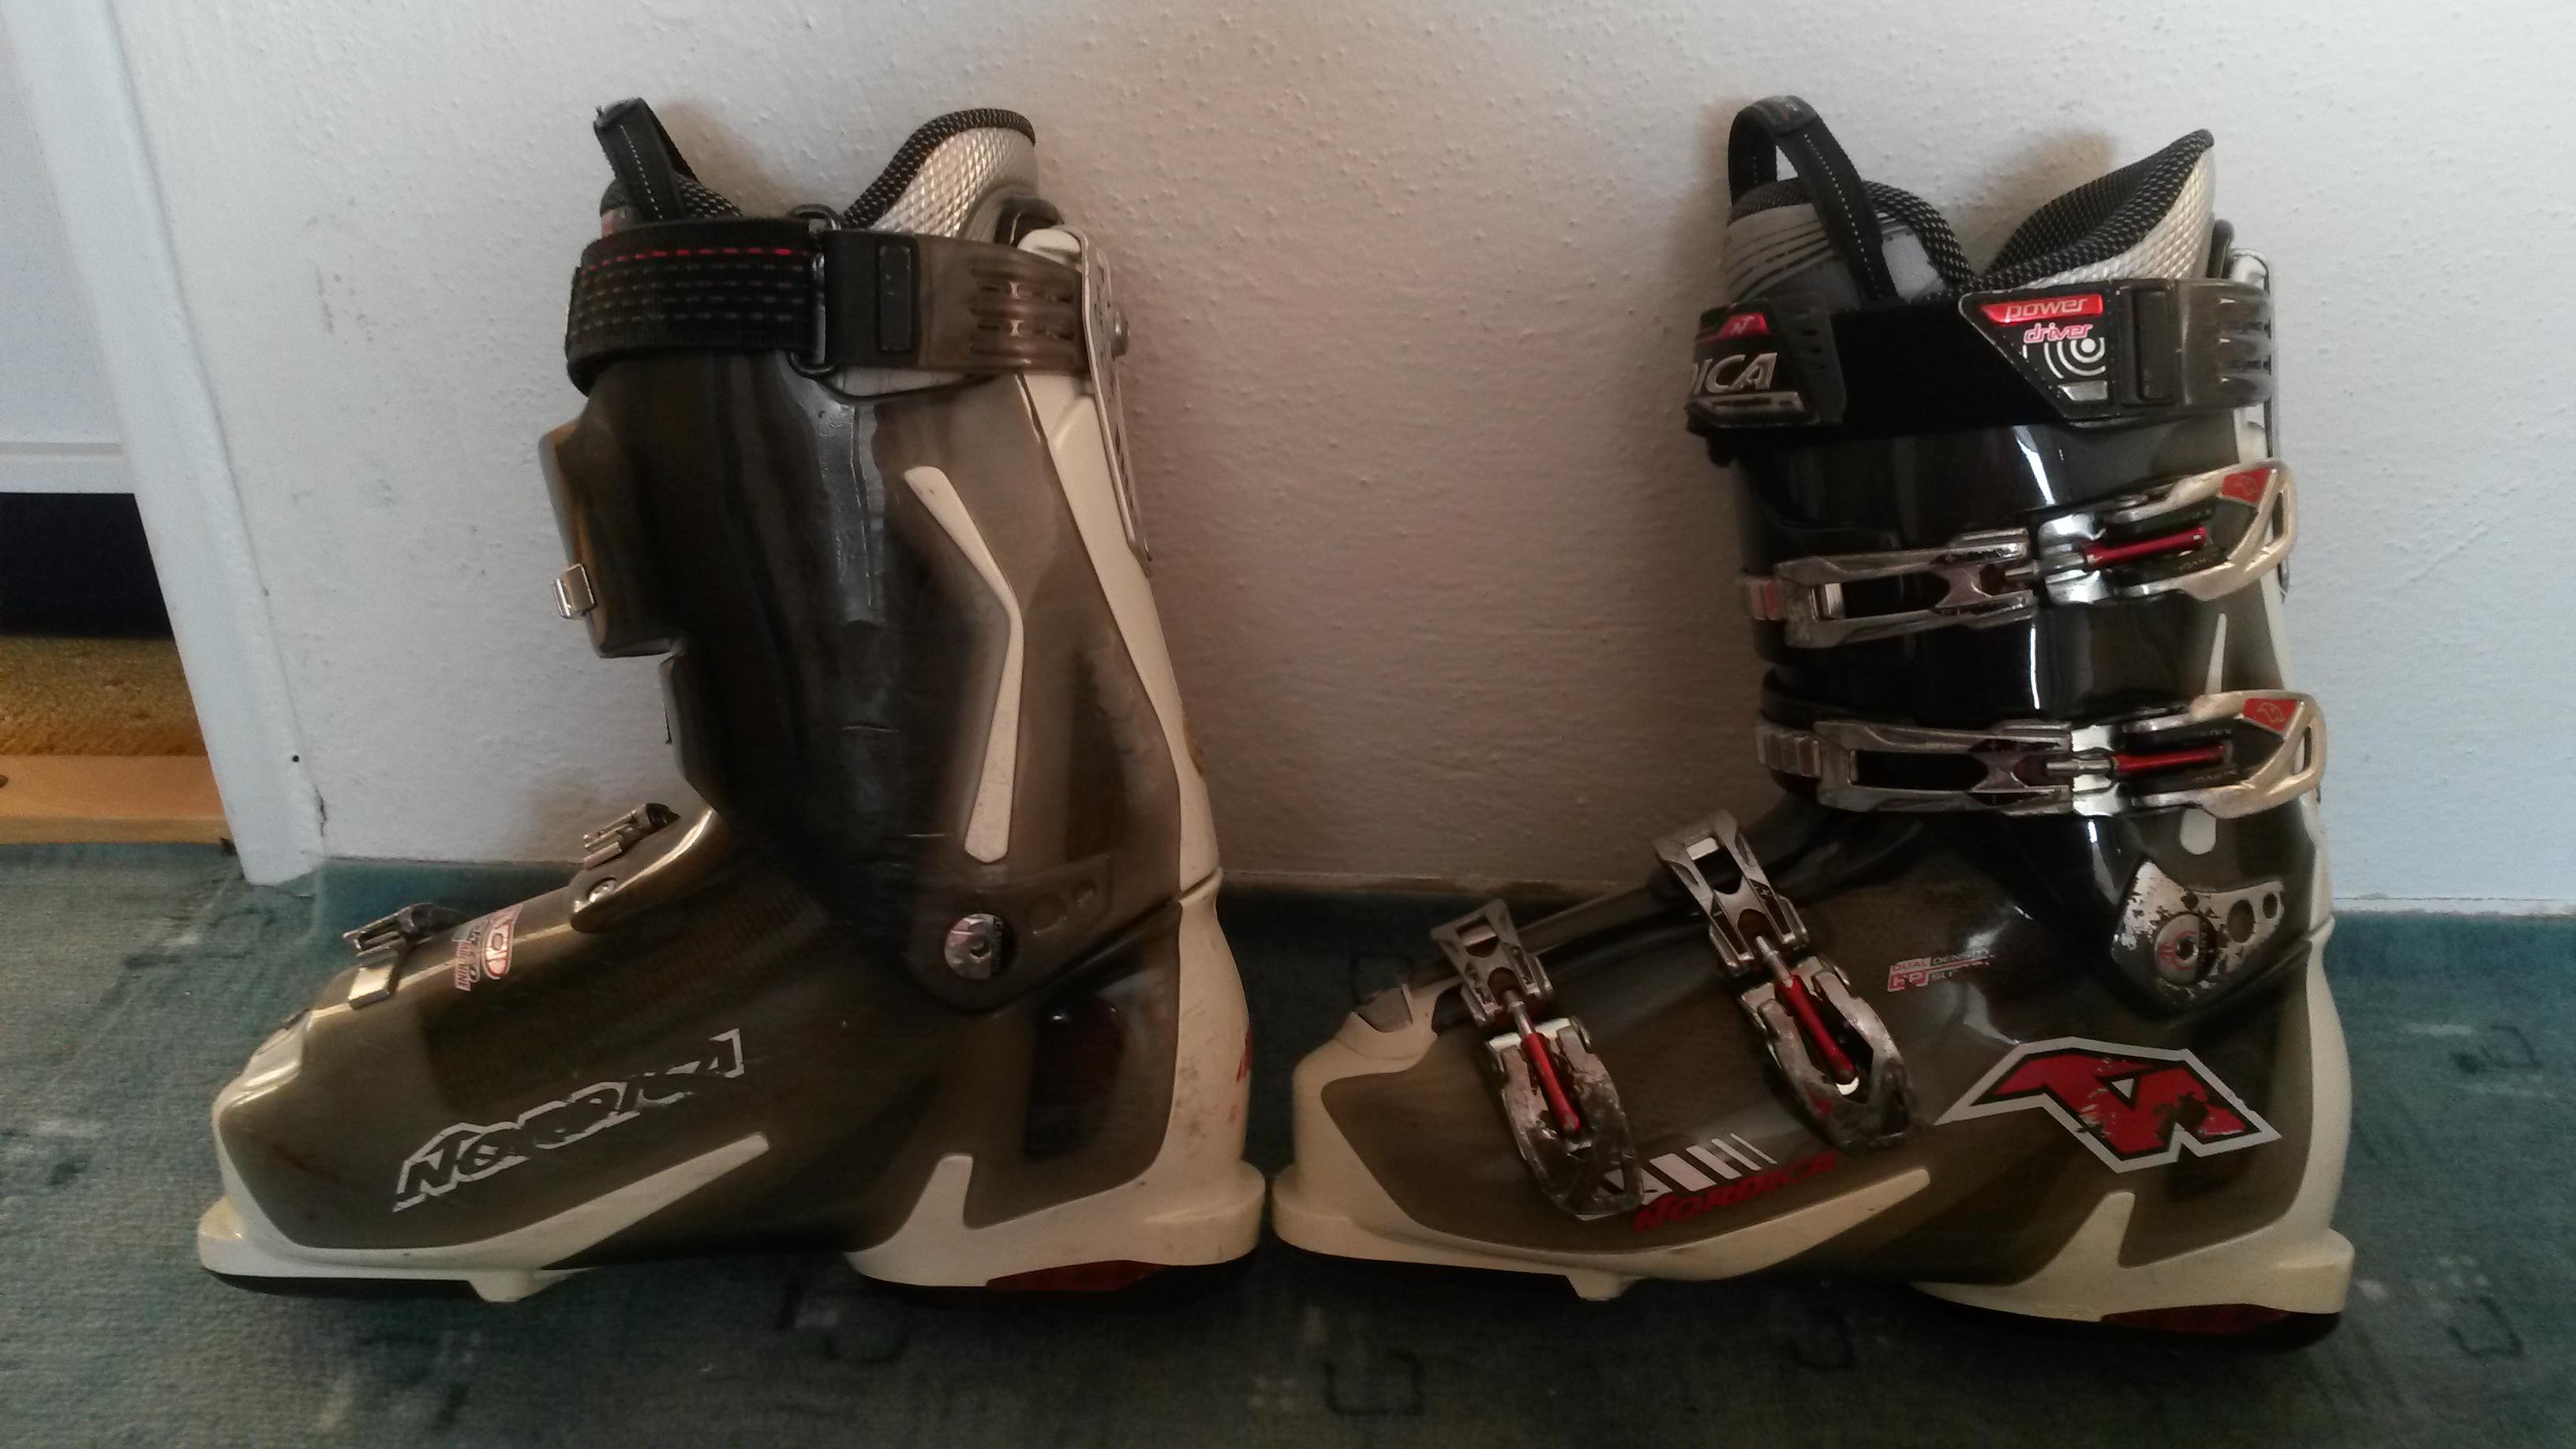 Lyžařské boty Nordica Speedmachine 10 - Bazar - SNOW.CZ 4b77553f3c